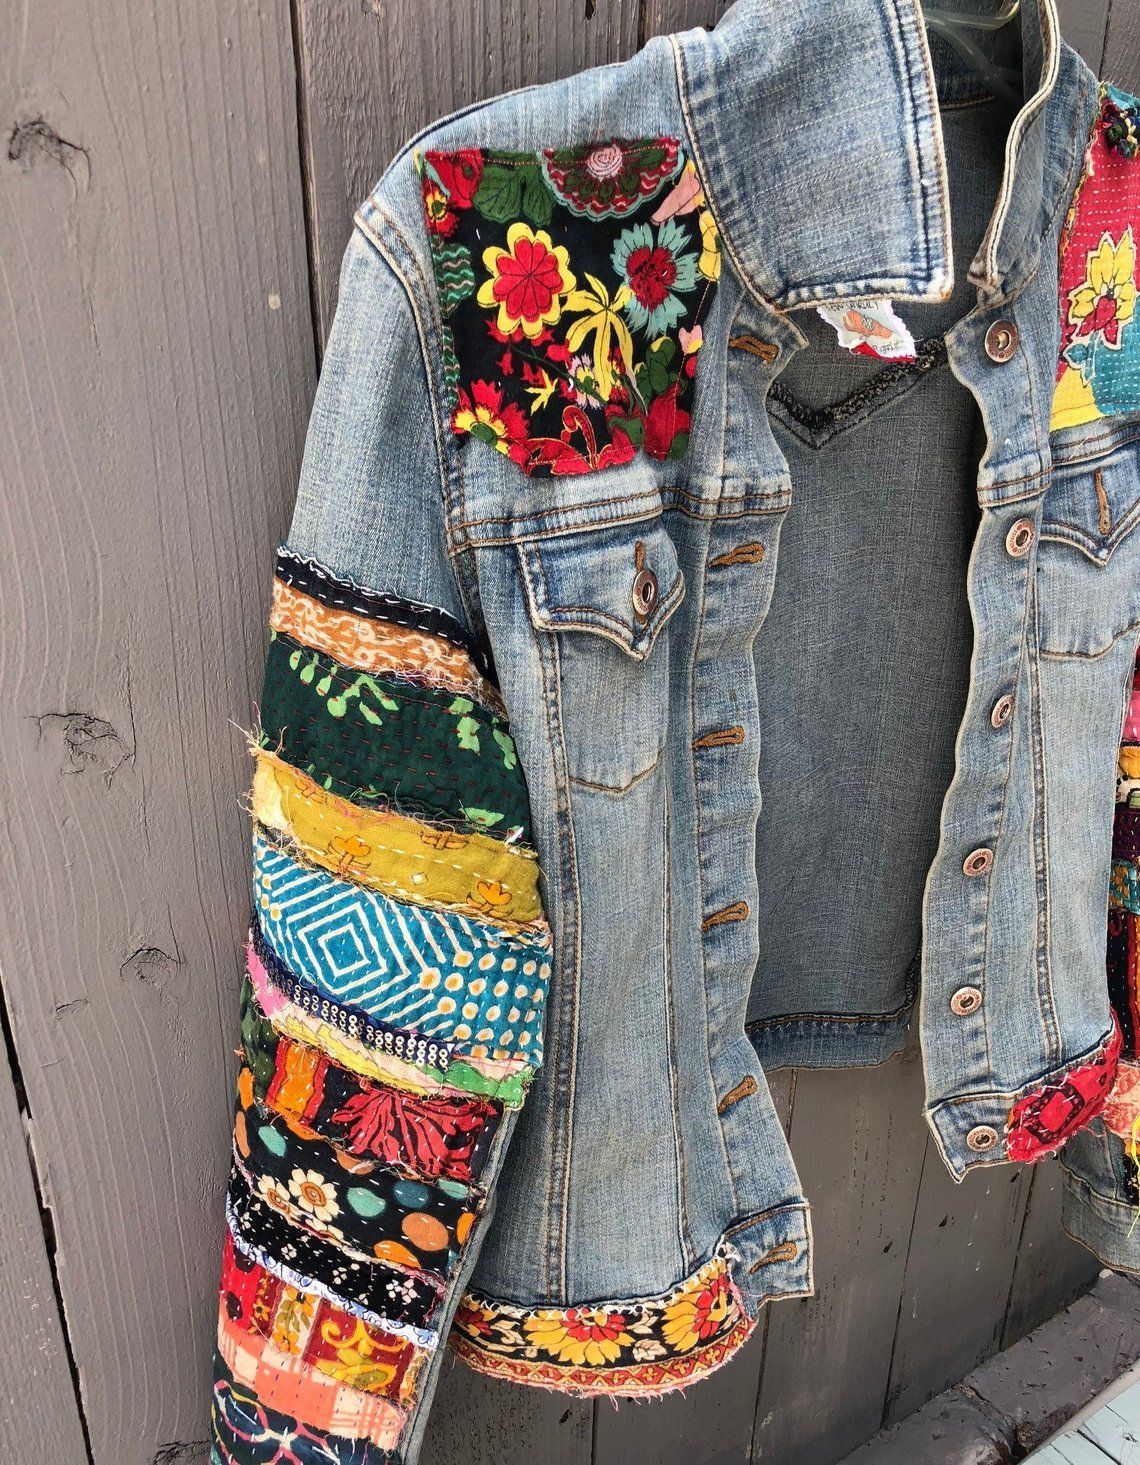 Jean Jacket Made To Order Hippie Boho Embellished Colorful Denim Jean Jacket Costumizar Jaqueta Jeans Roupas Bordadas Customizar Roupas [ 1465 x 1140 Pixel ]